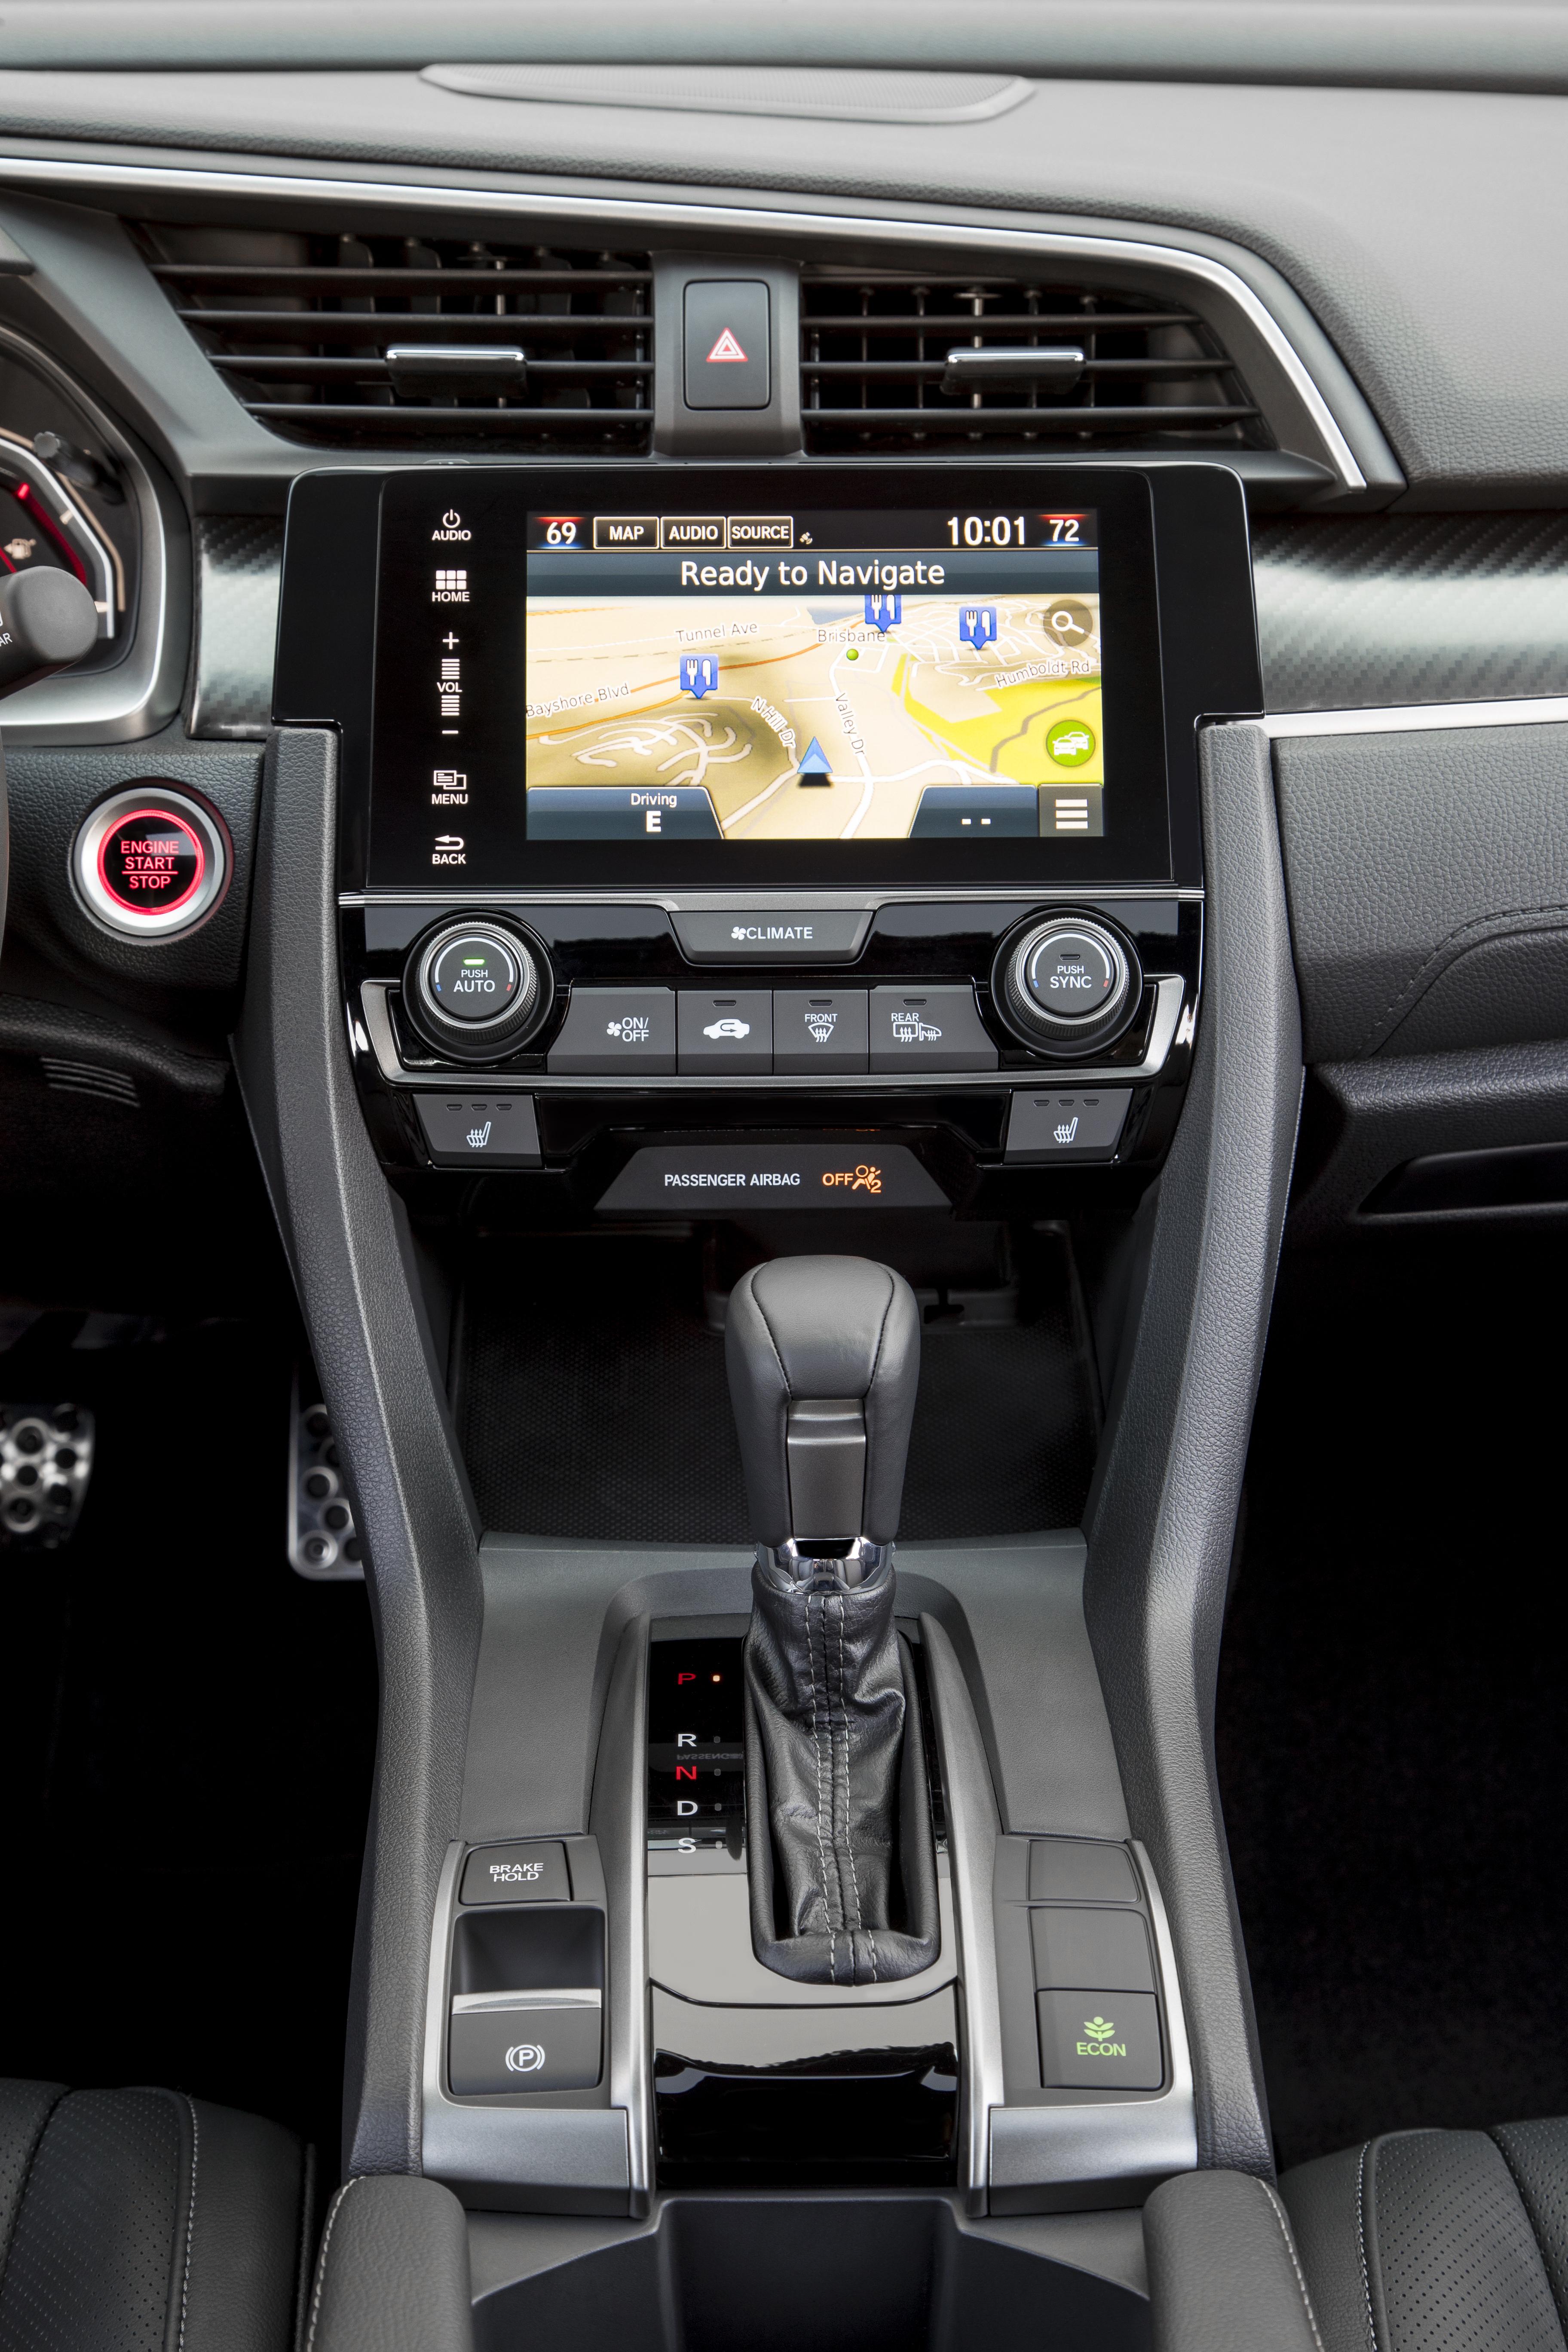 2017 Honda Civic Hatchback Standard Bearer